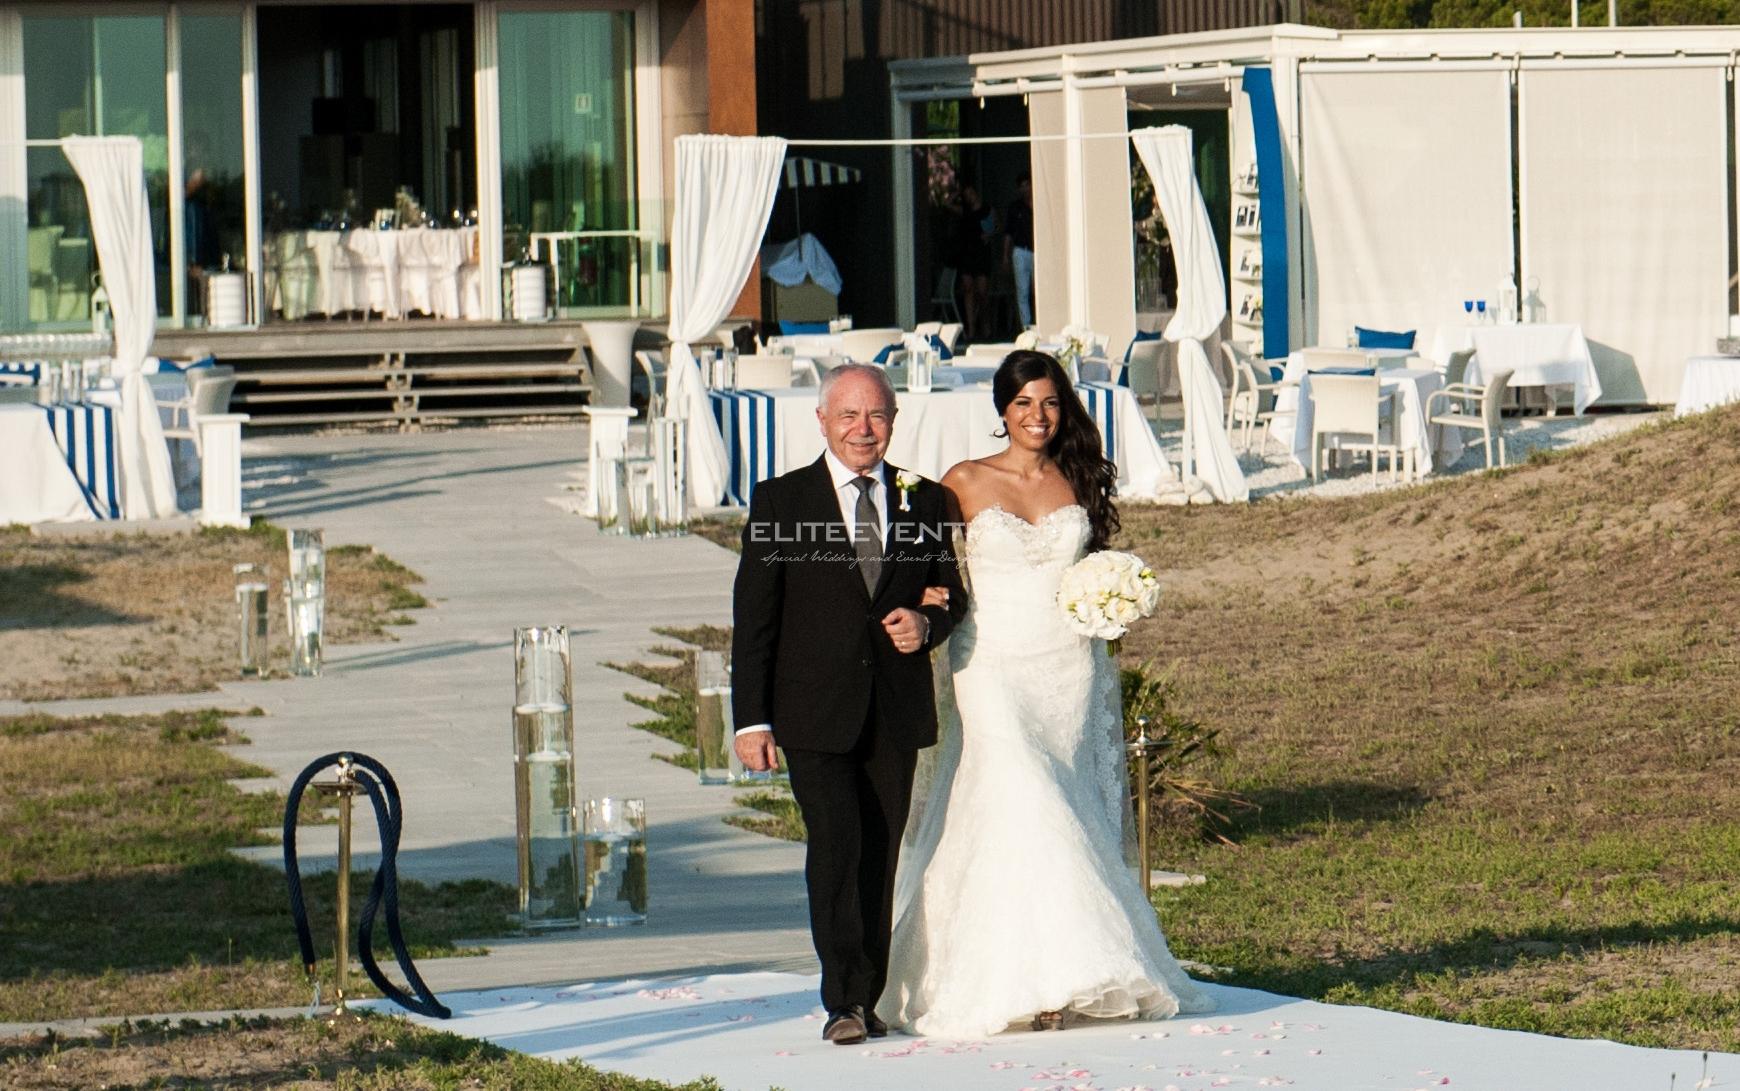 matrimonio-costa-dei-barbari-eliteeventi-4